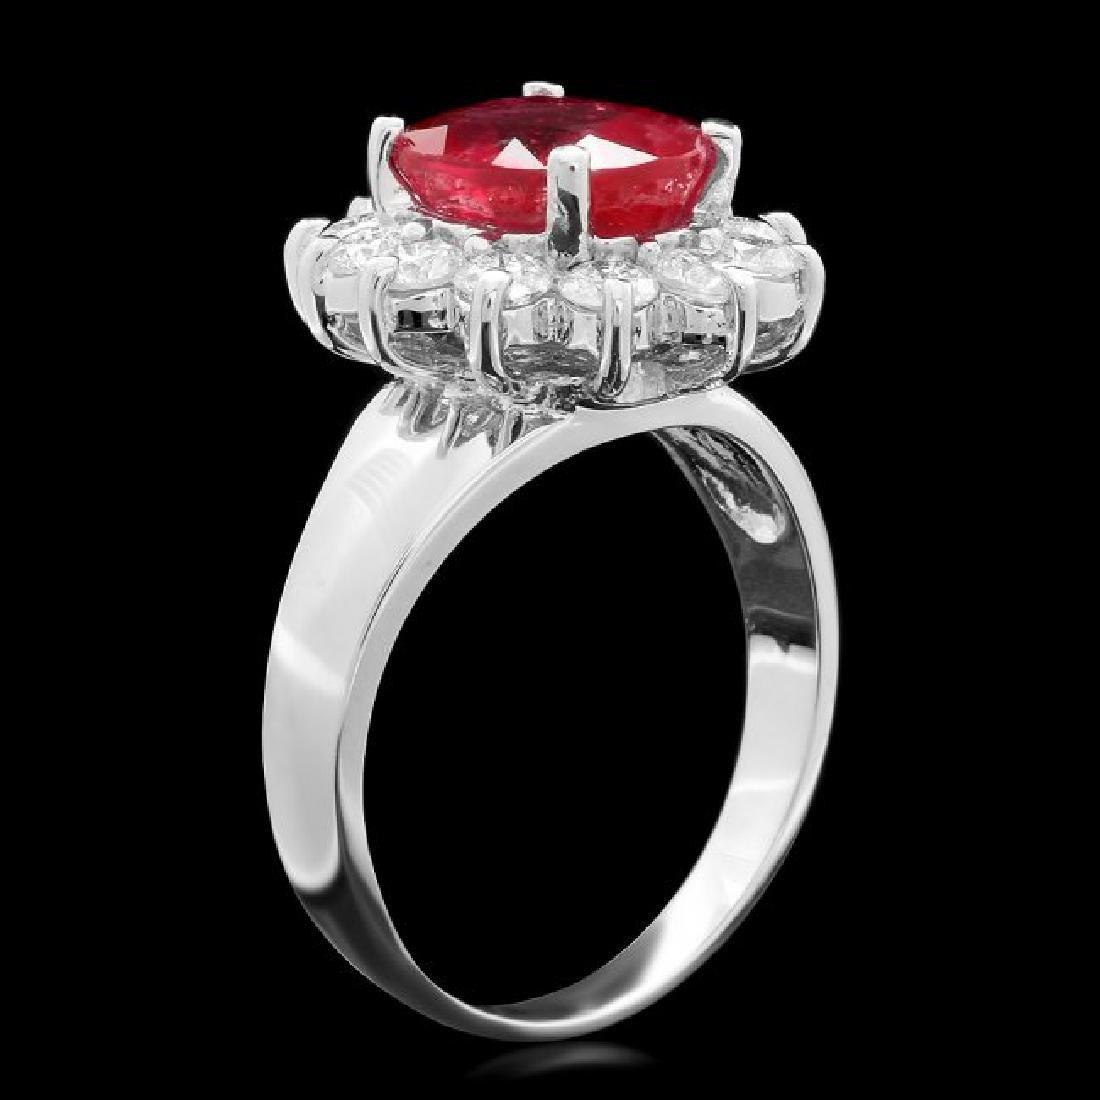 14k White Gold 3.50ct Ruby 1.00ct Diamond Ring - 2